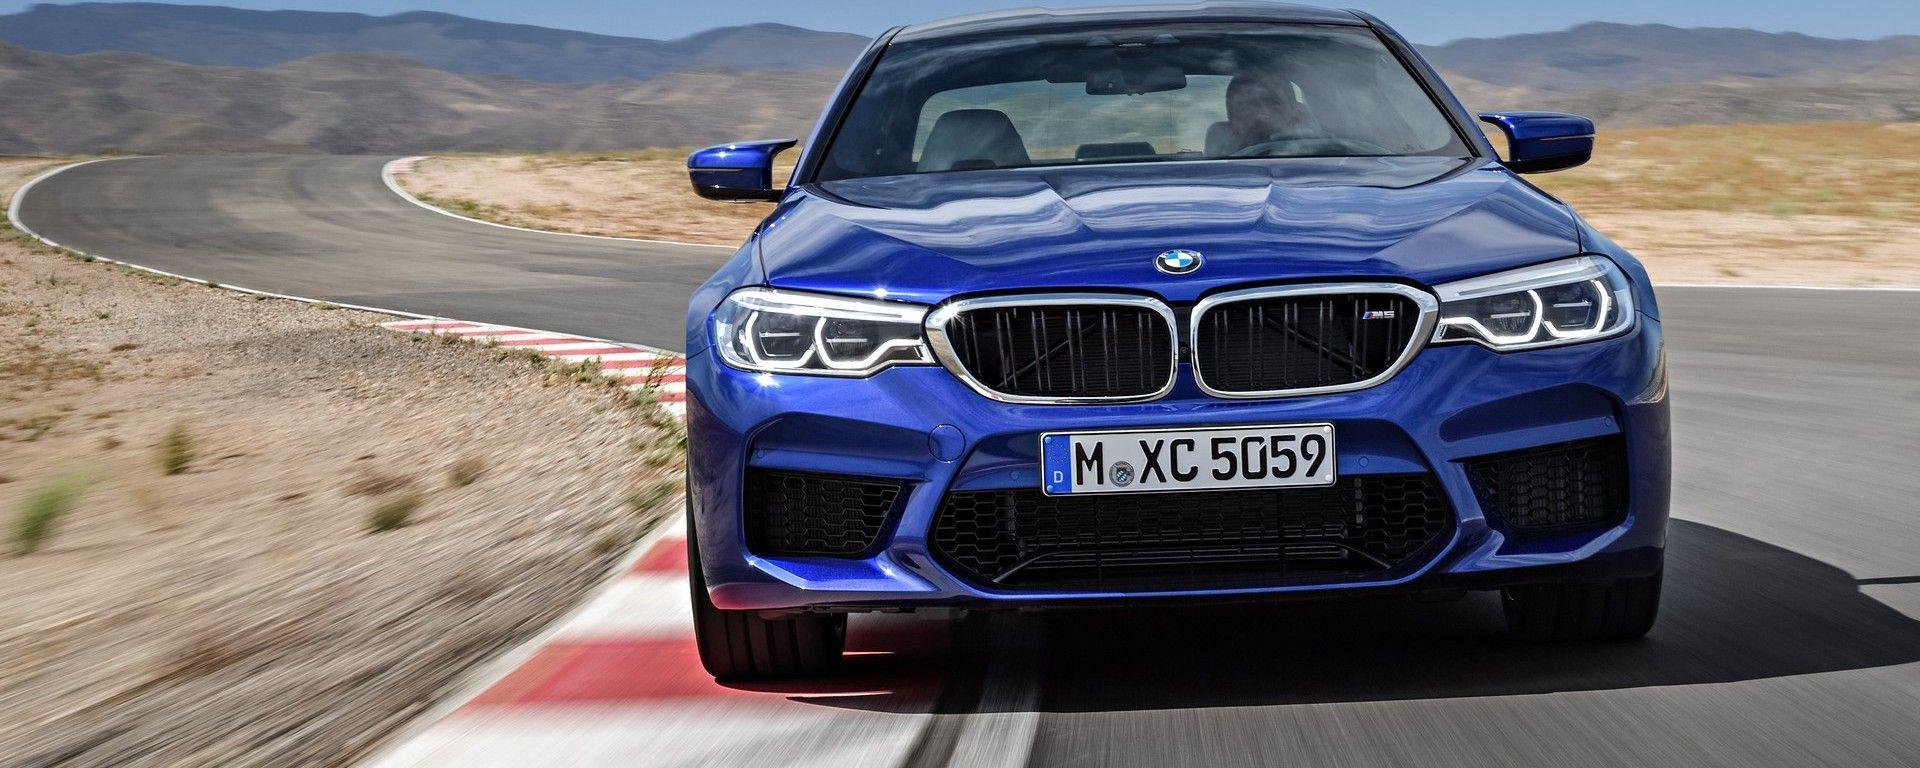 BMW M5 2018 (F90): vista frontale